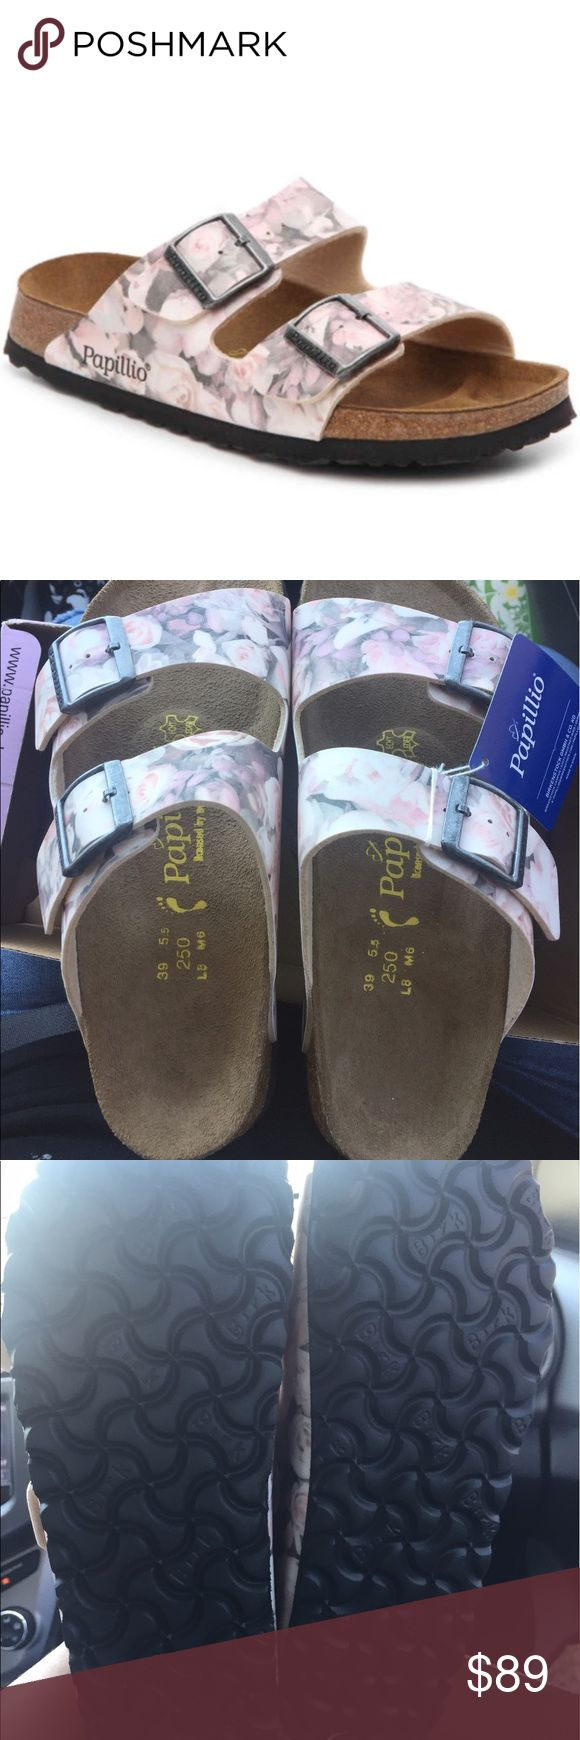 NEW BIRKENSTOCK ARIZONA PAPILLIO EURO39/ WMNS 8 New never used. ARIZONA STYLE 364133. Size US 8-8.5 NARROW FIT. BIRKO FLOR STRAPS. BOX IS MISSING LID. Birkenstock Shoes Sandals